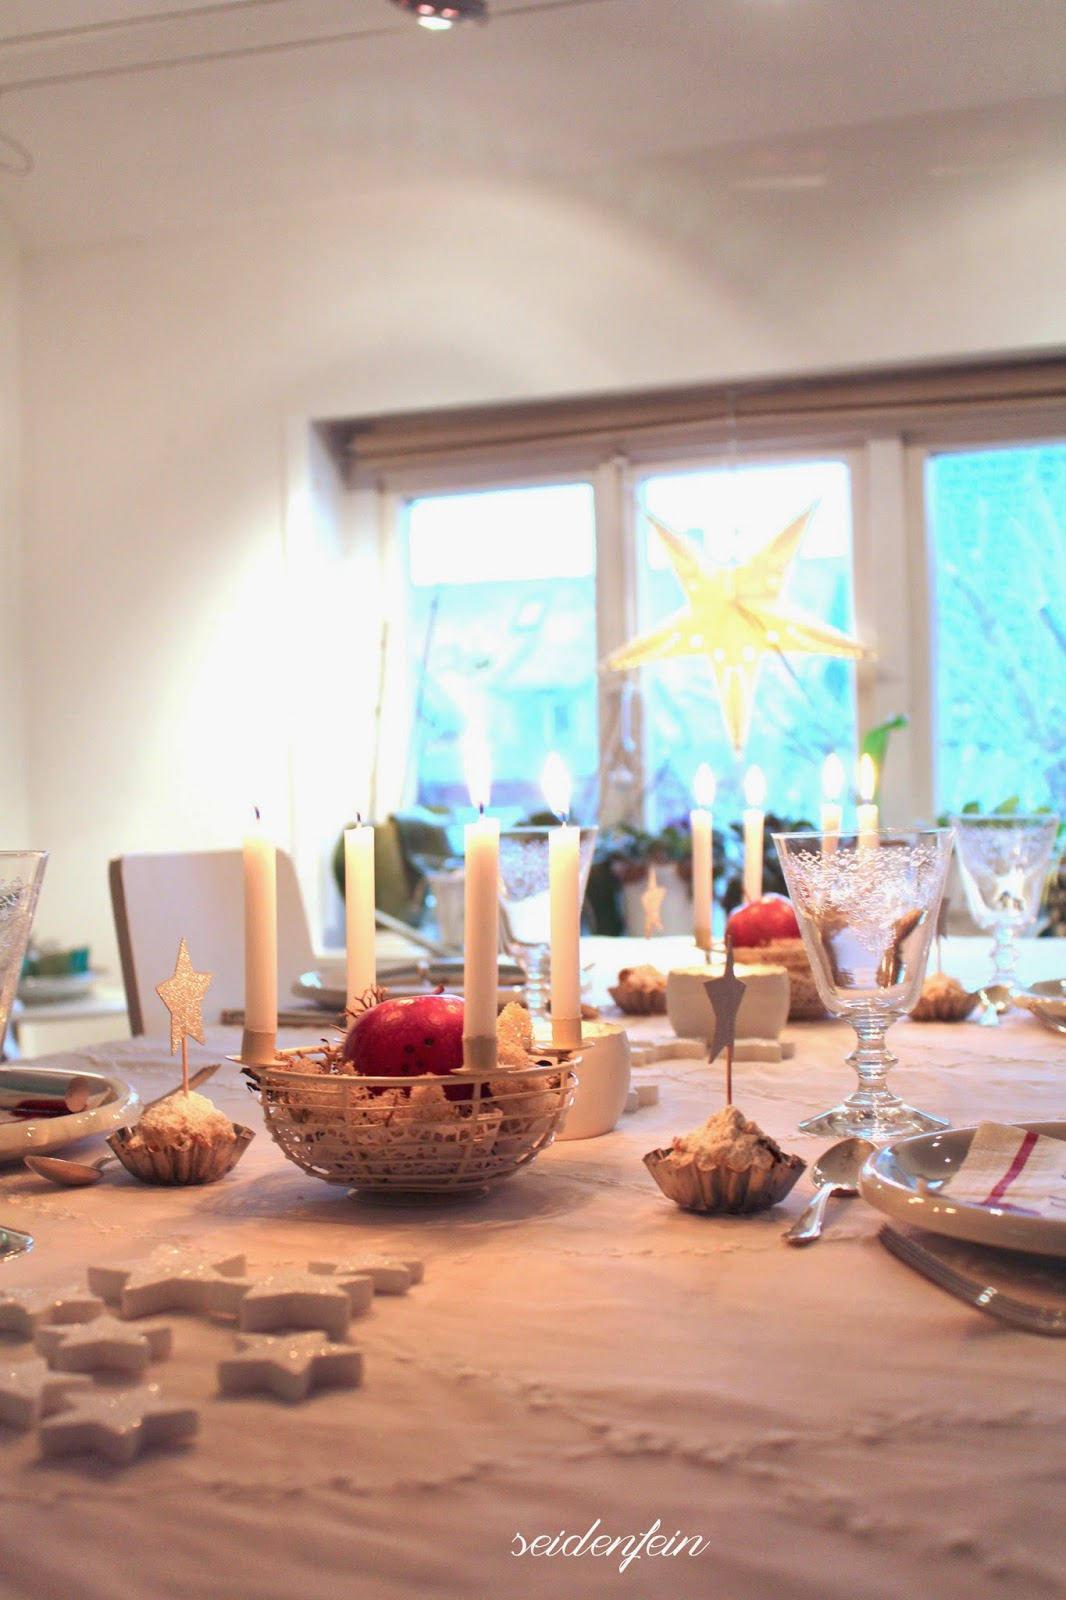 seidenfeins blog vom sch nen landleben 24 heilig abend christmas is here. Black Bedroom Furniture Sets. Home Design Ideas